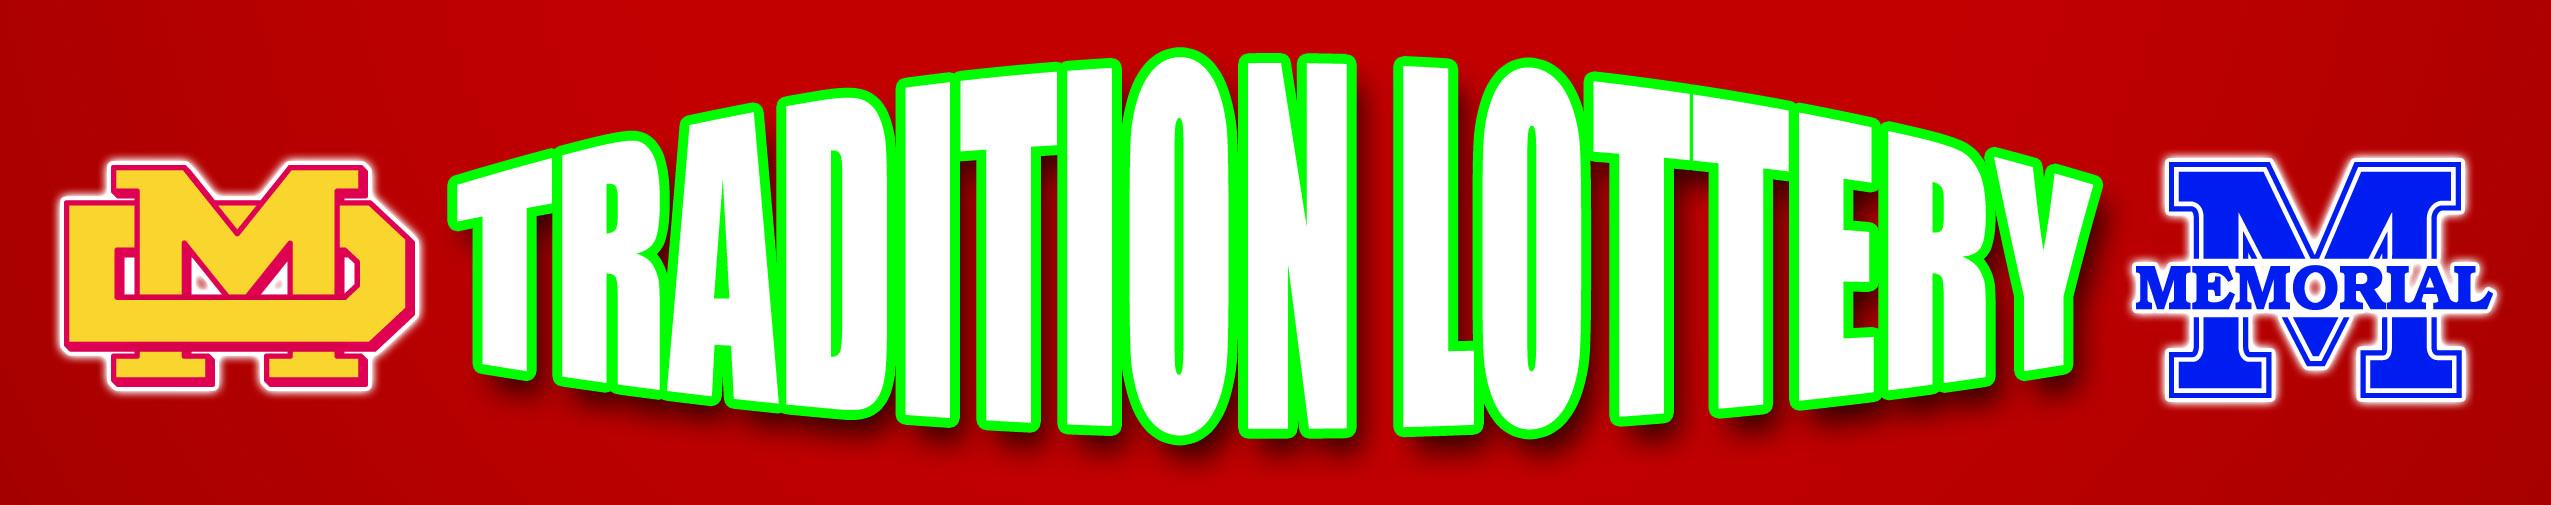 Tradition Lottery Logo